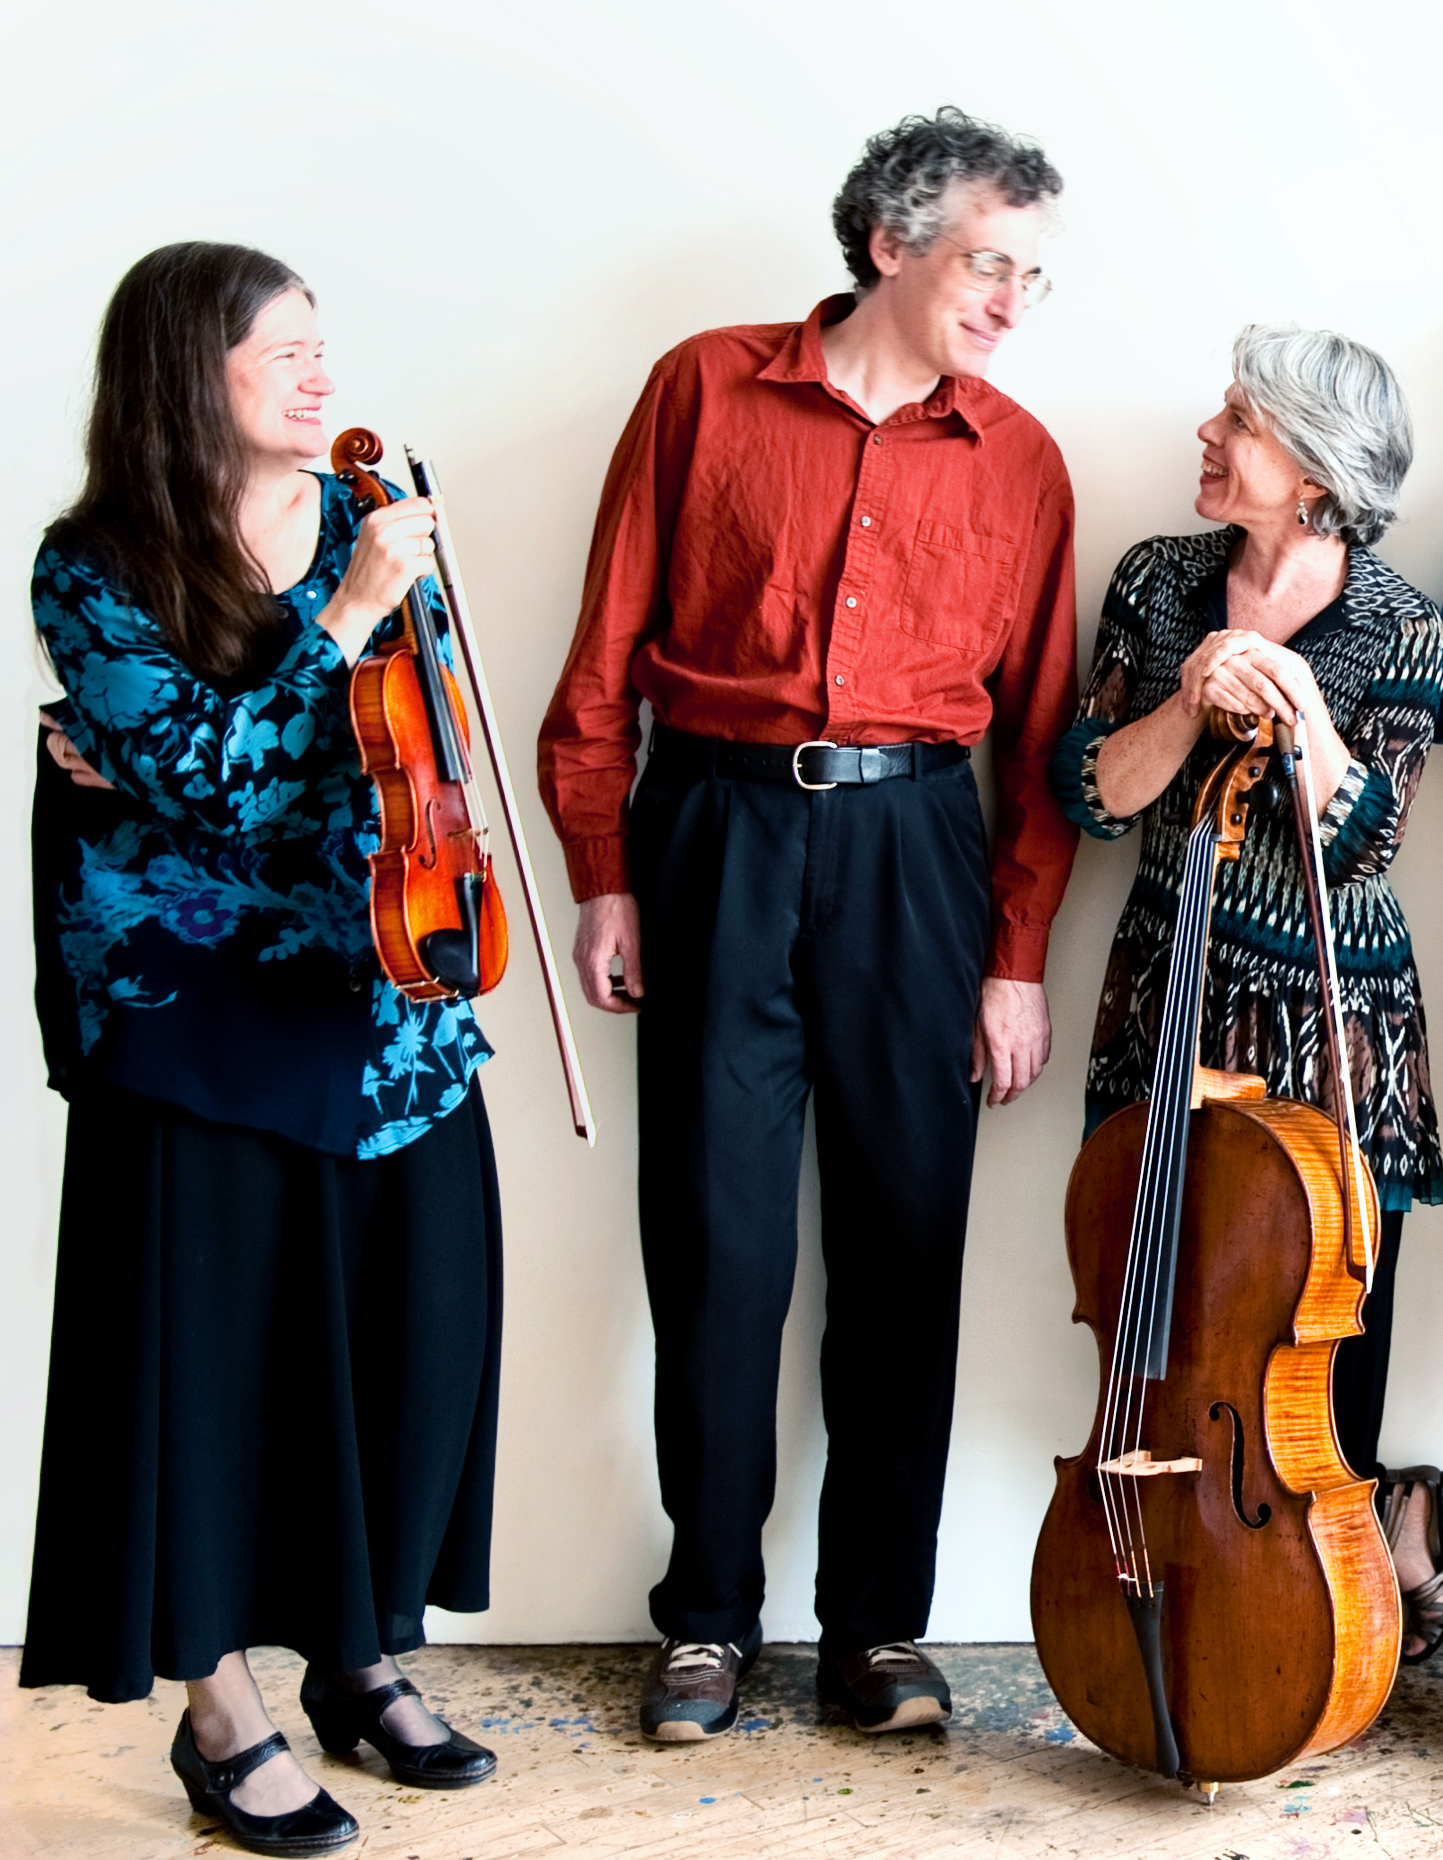 Anna Presler (violin), Eric Zivian (piano), Tanya Tomkins (cello) by Lydia Chen